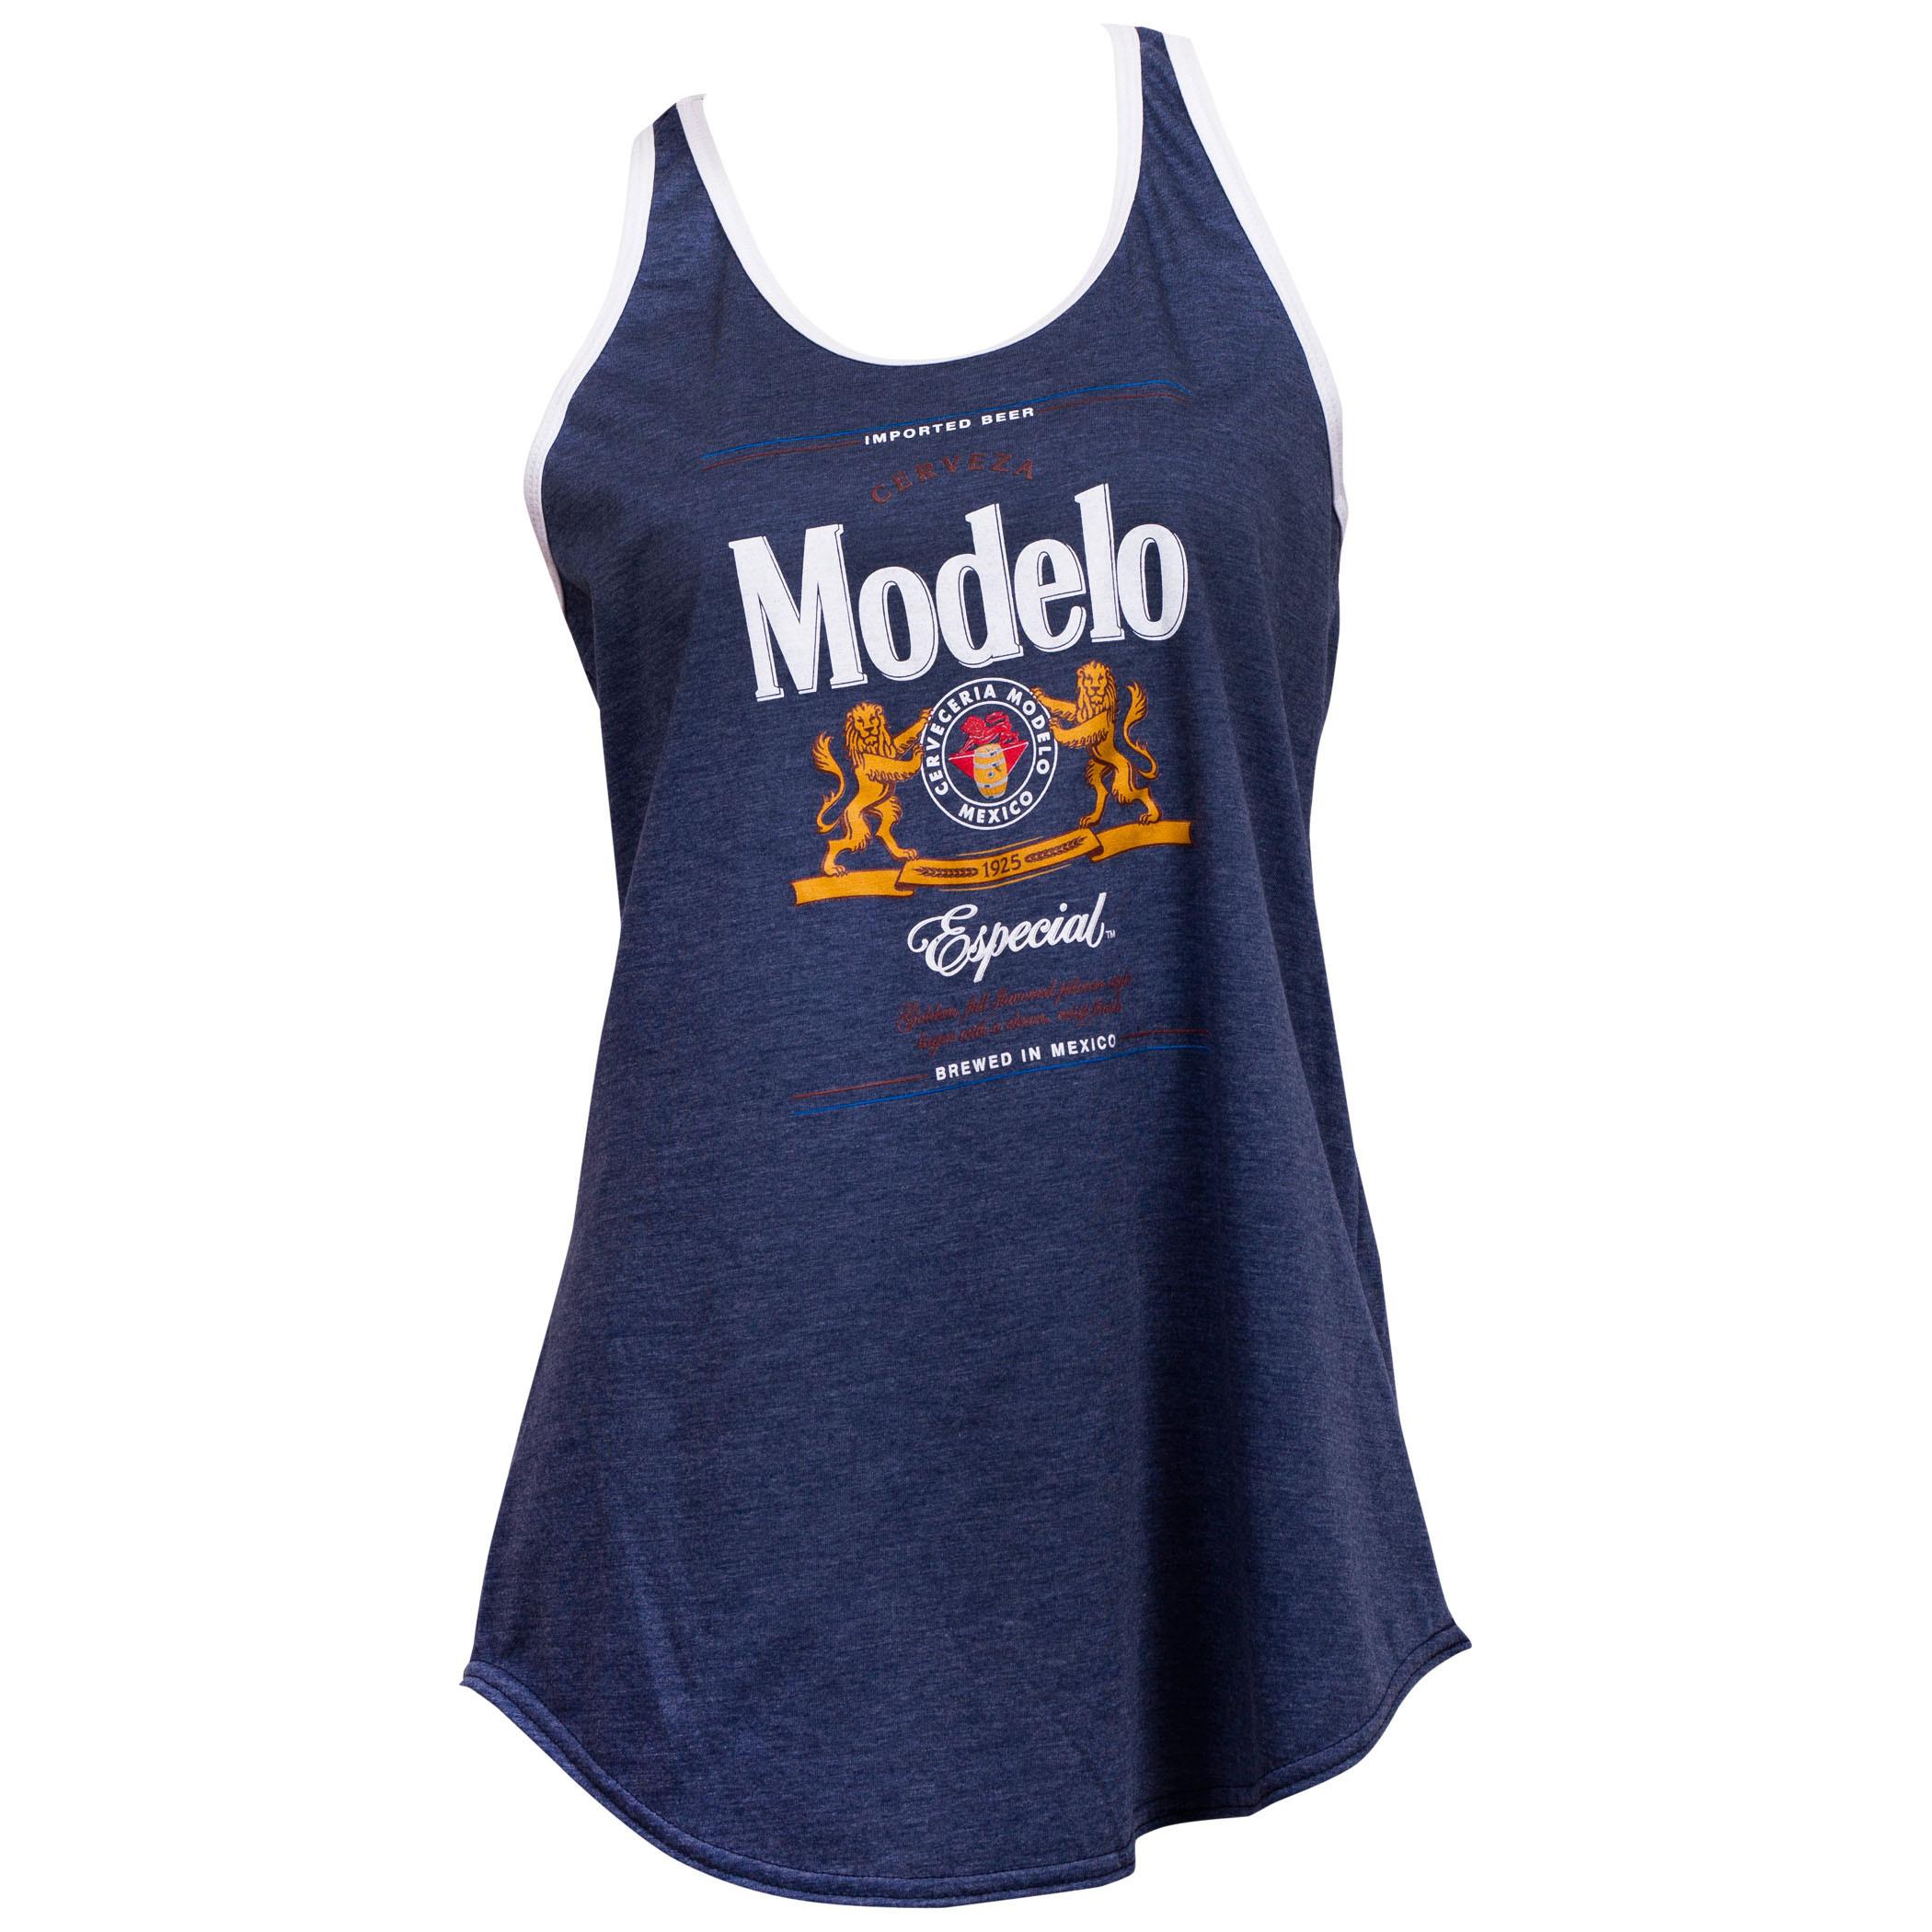 Modelo Especial Label White Trim Women's Racerback Tank Top